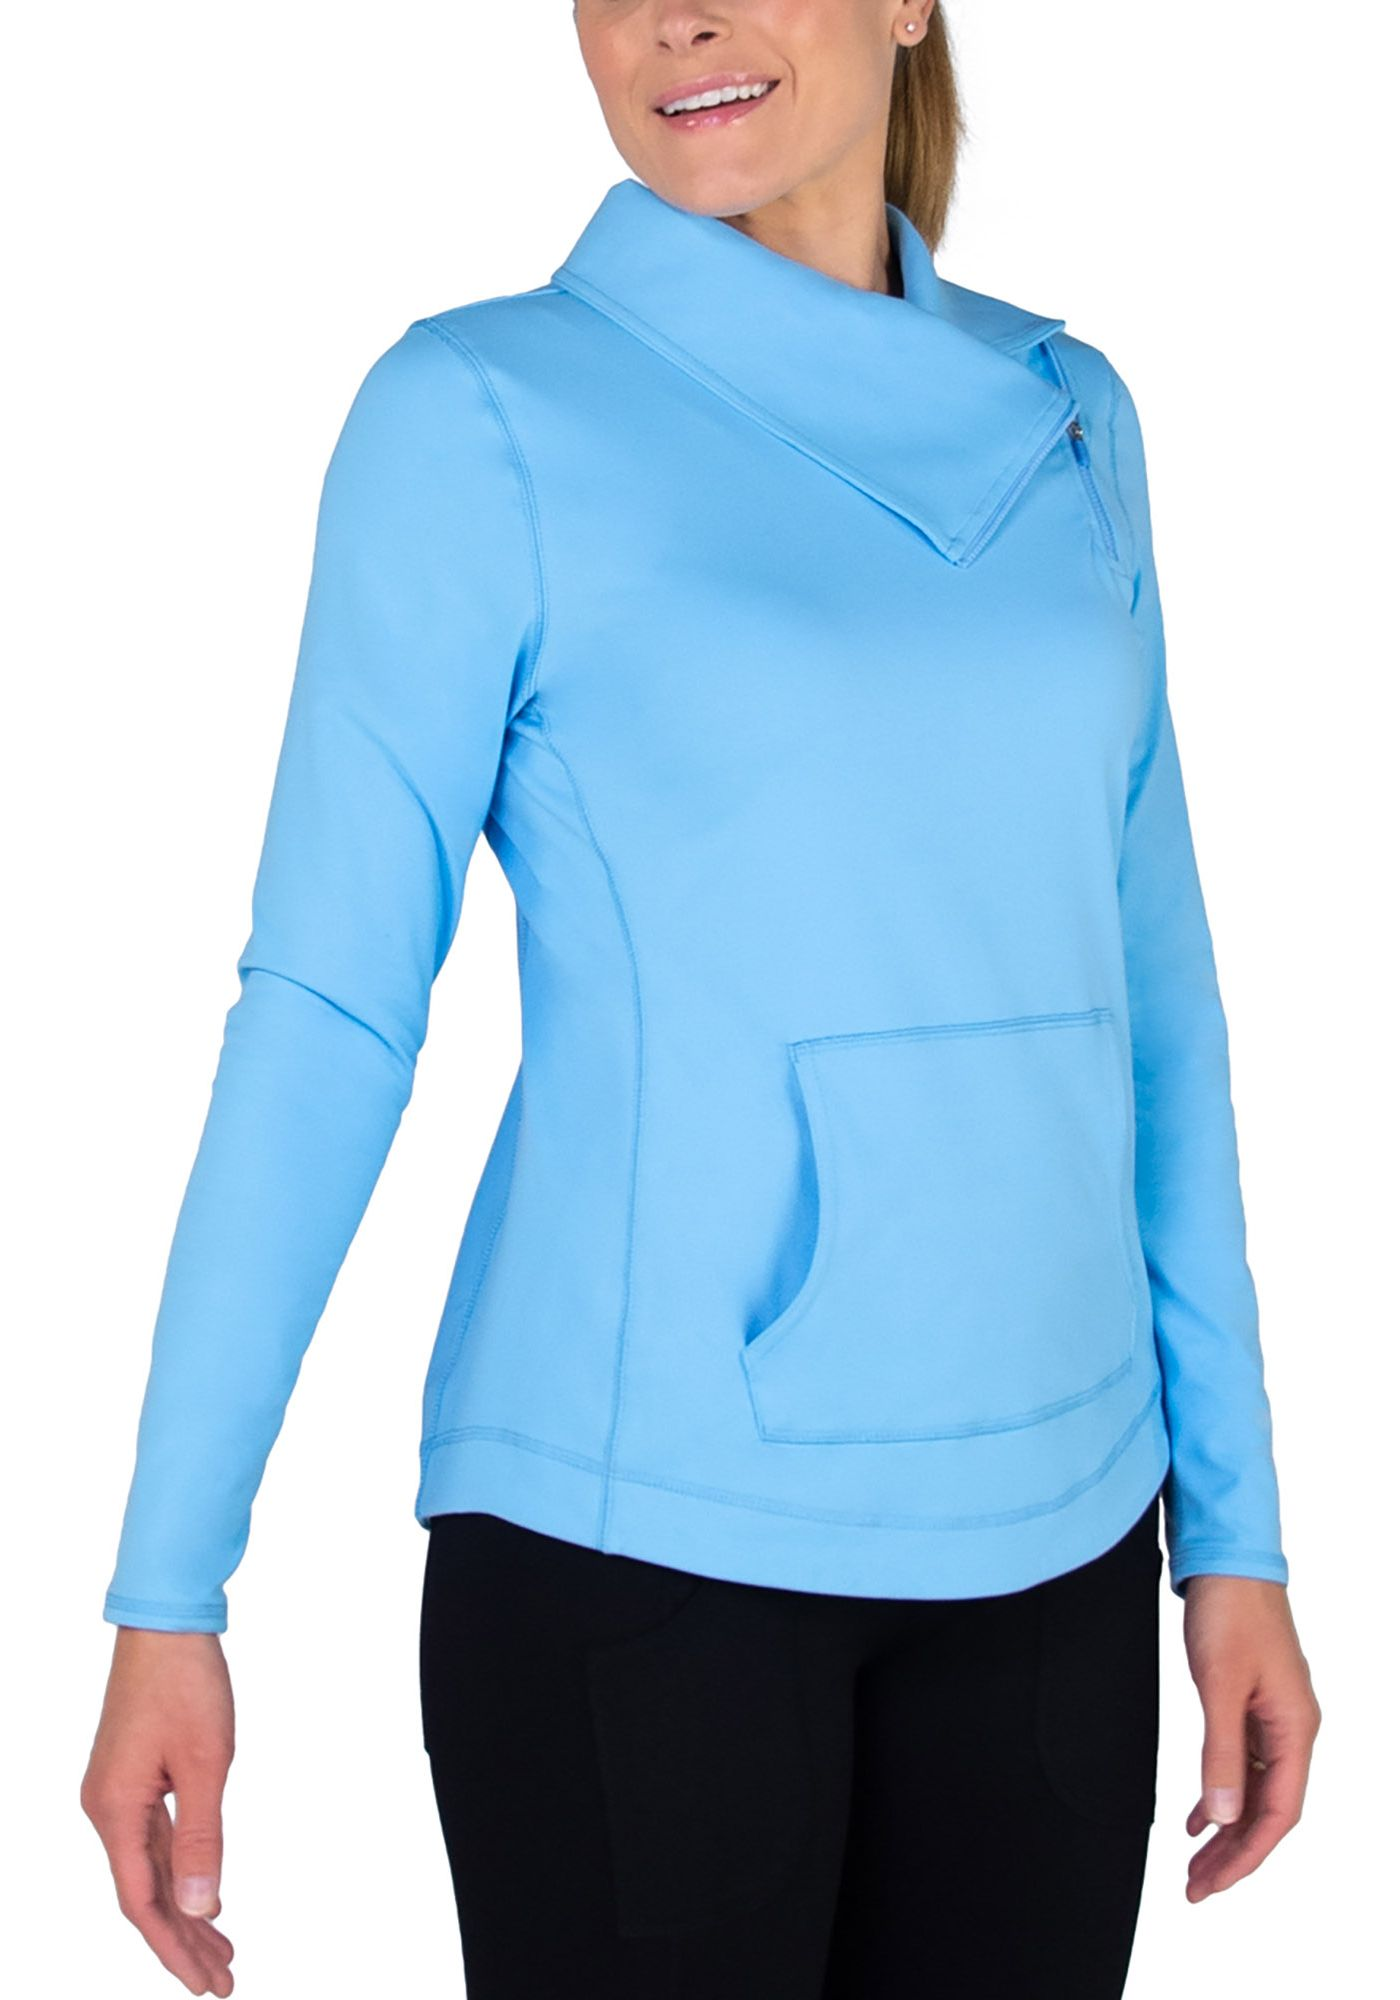 Jofit Women's Jumper Golf Pullover